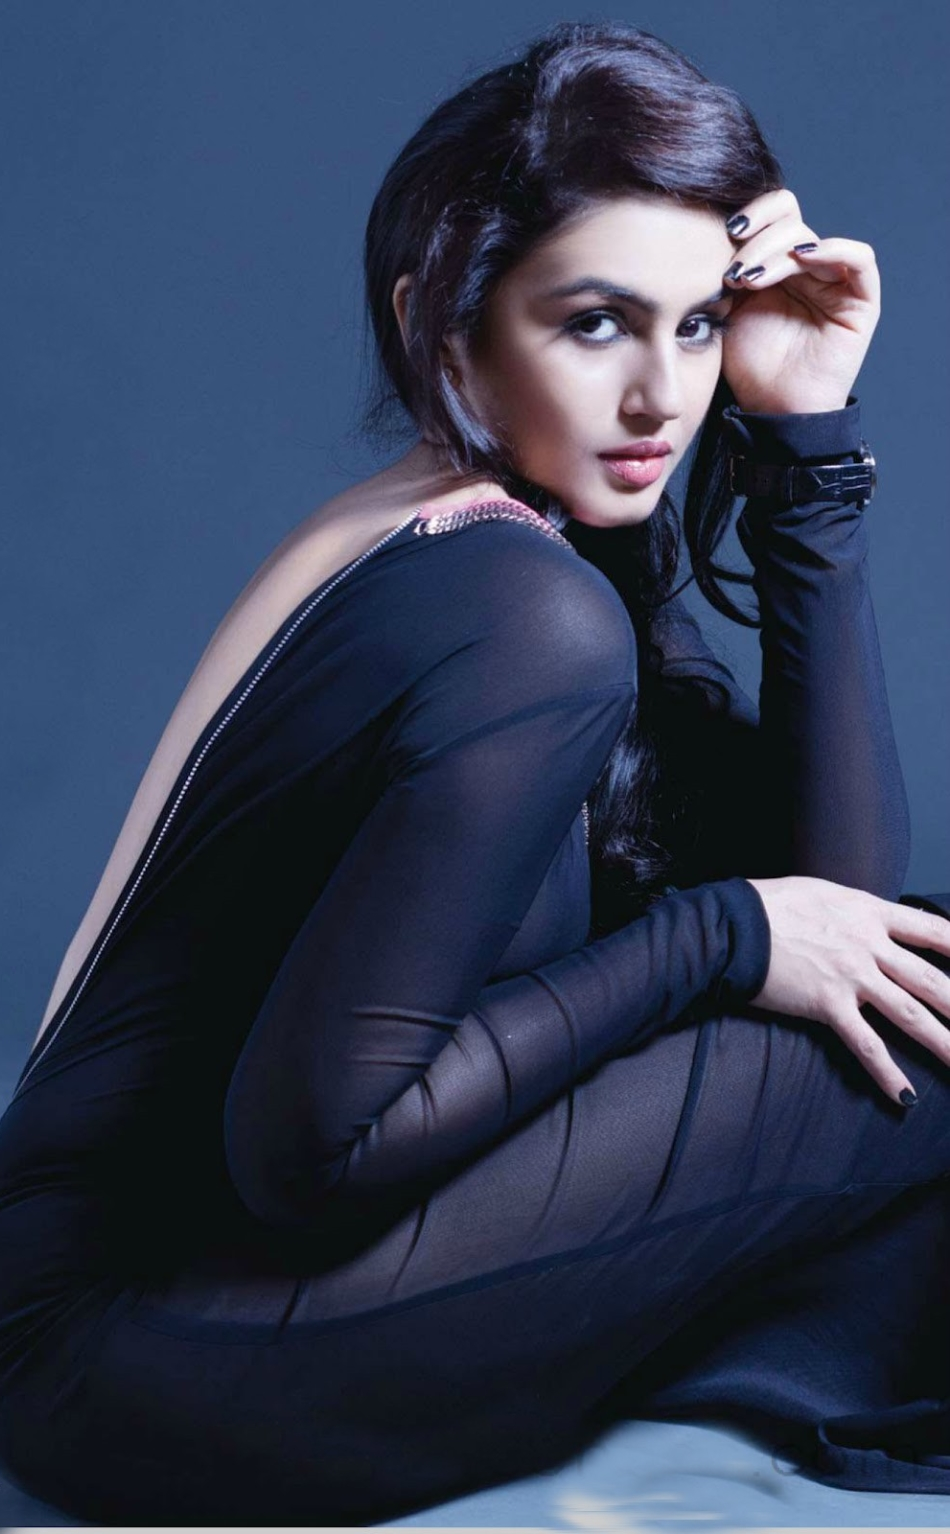 Huma Qureshi Hot Photoshoot, Hd Wallpaper-2306